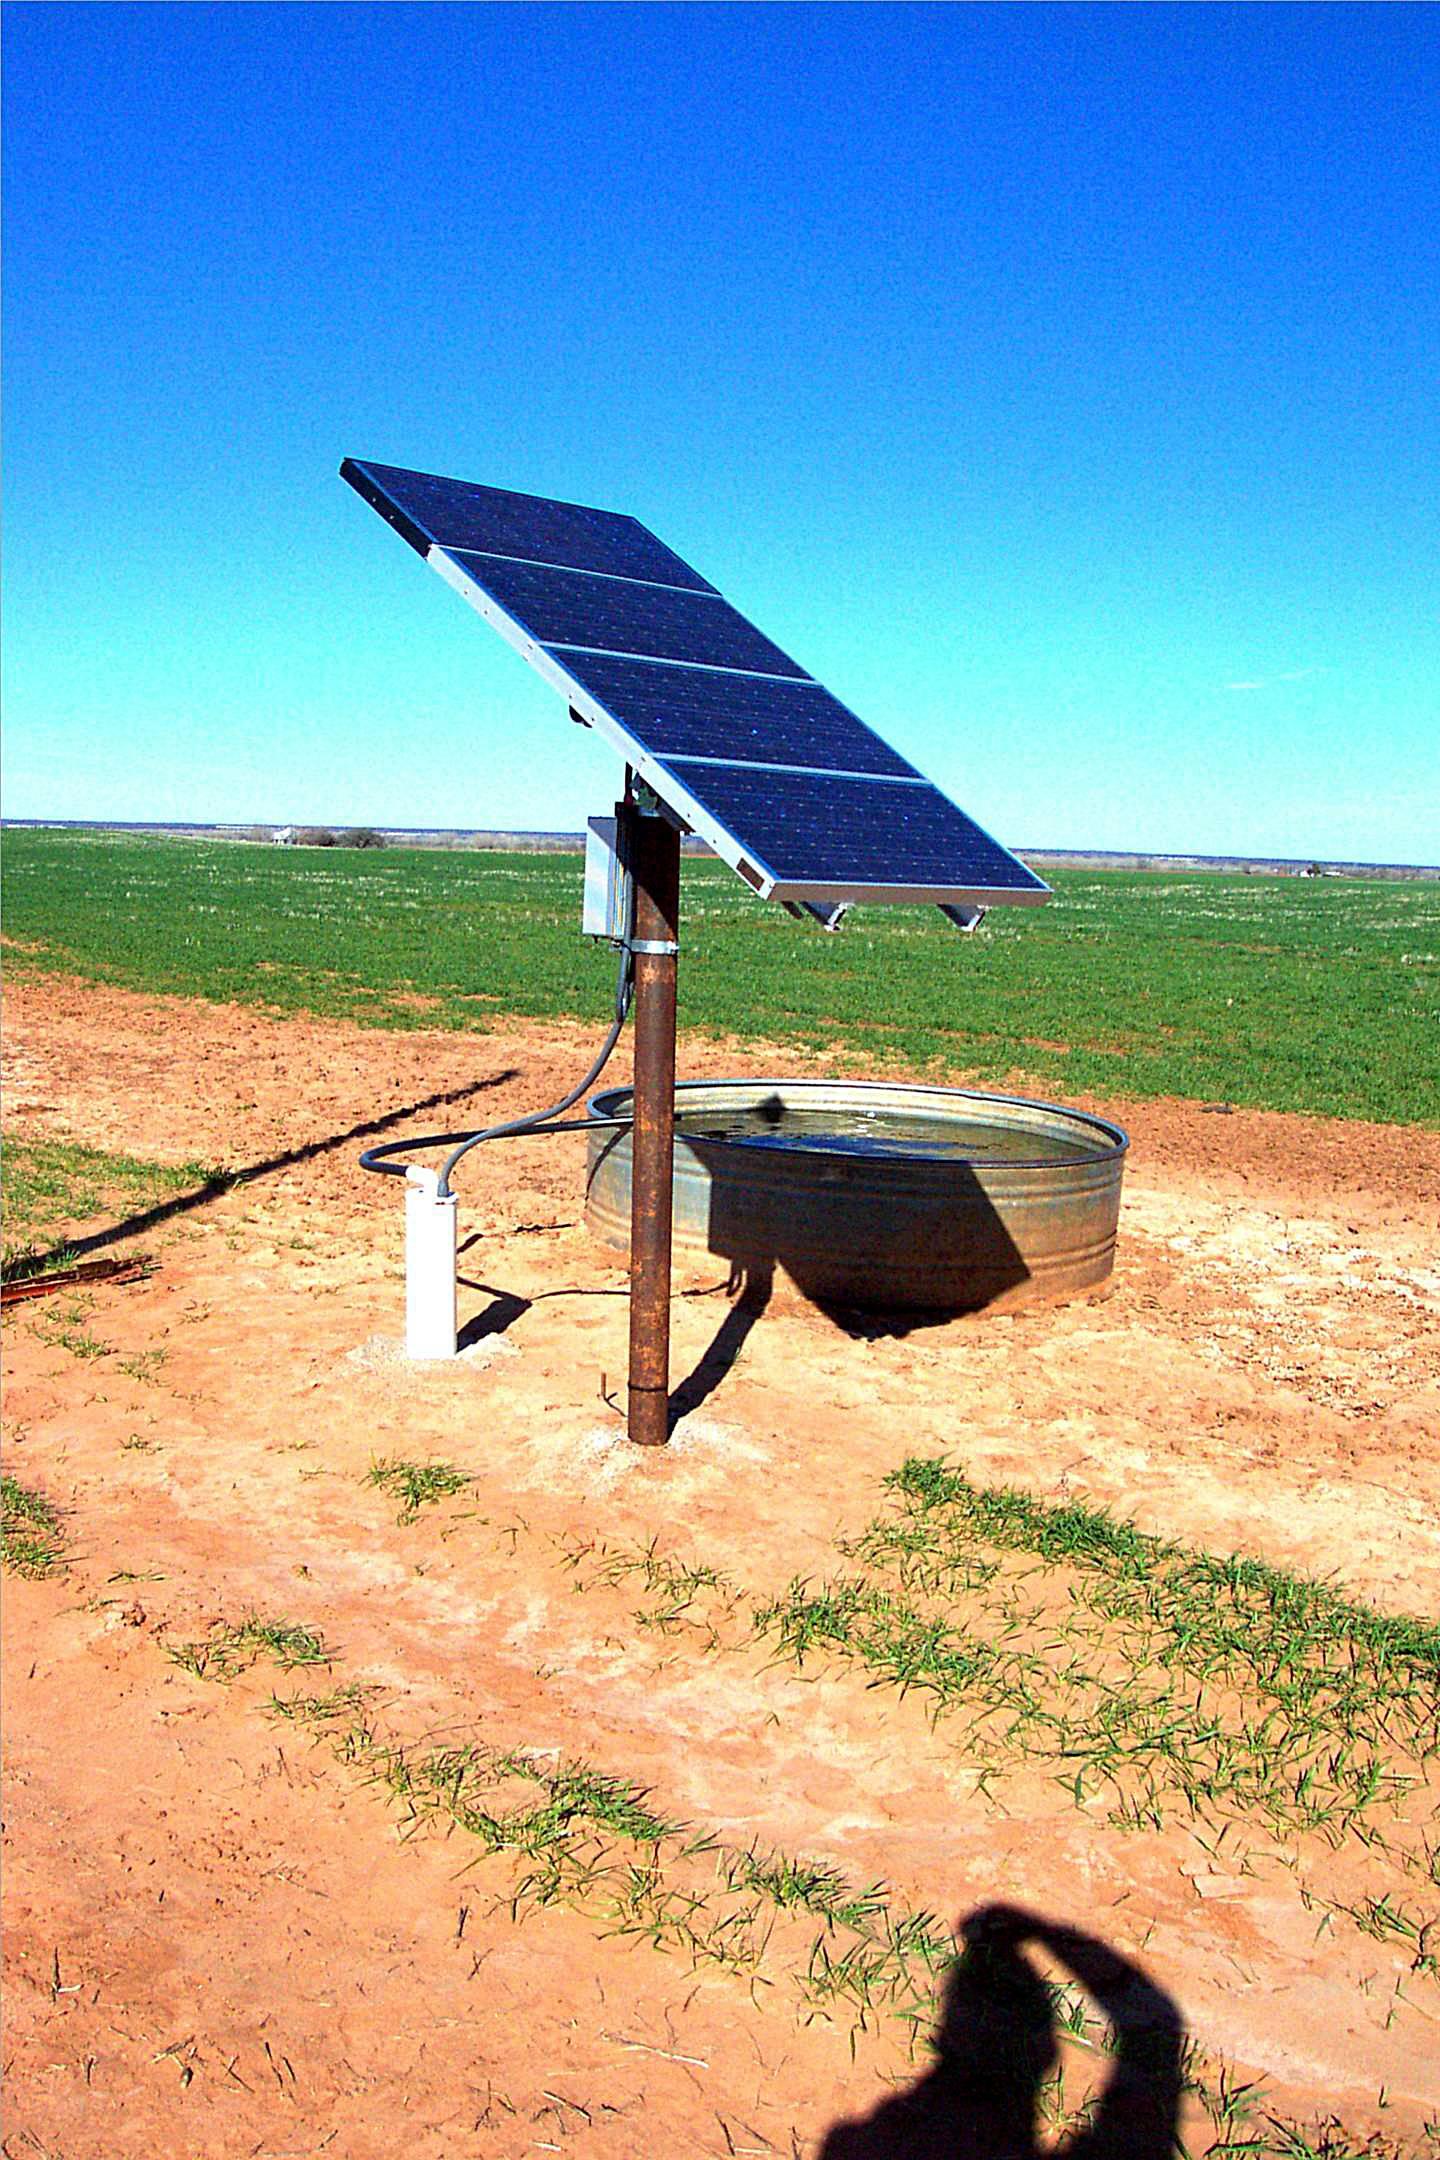 Dig Eco Solar Powered Irrigation Controller Installation in addition Solar Smart Irrigation System additionally Solar Pump likewise Solar Smart Irrigation System in addition Seiling Sunrotor Solar Pumping System Livestock Watering. on solar power irrigation controller